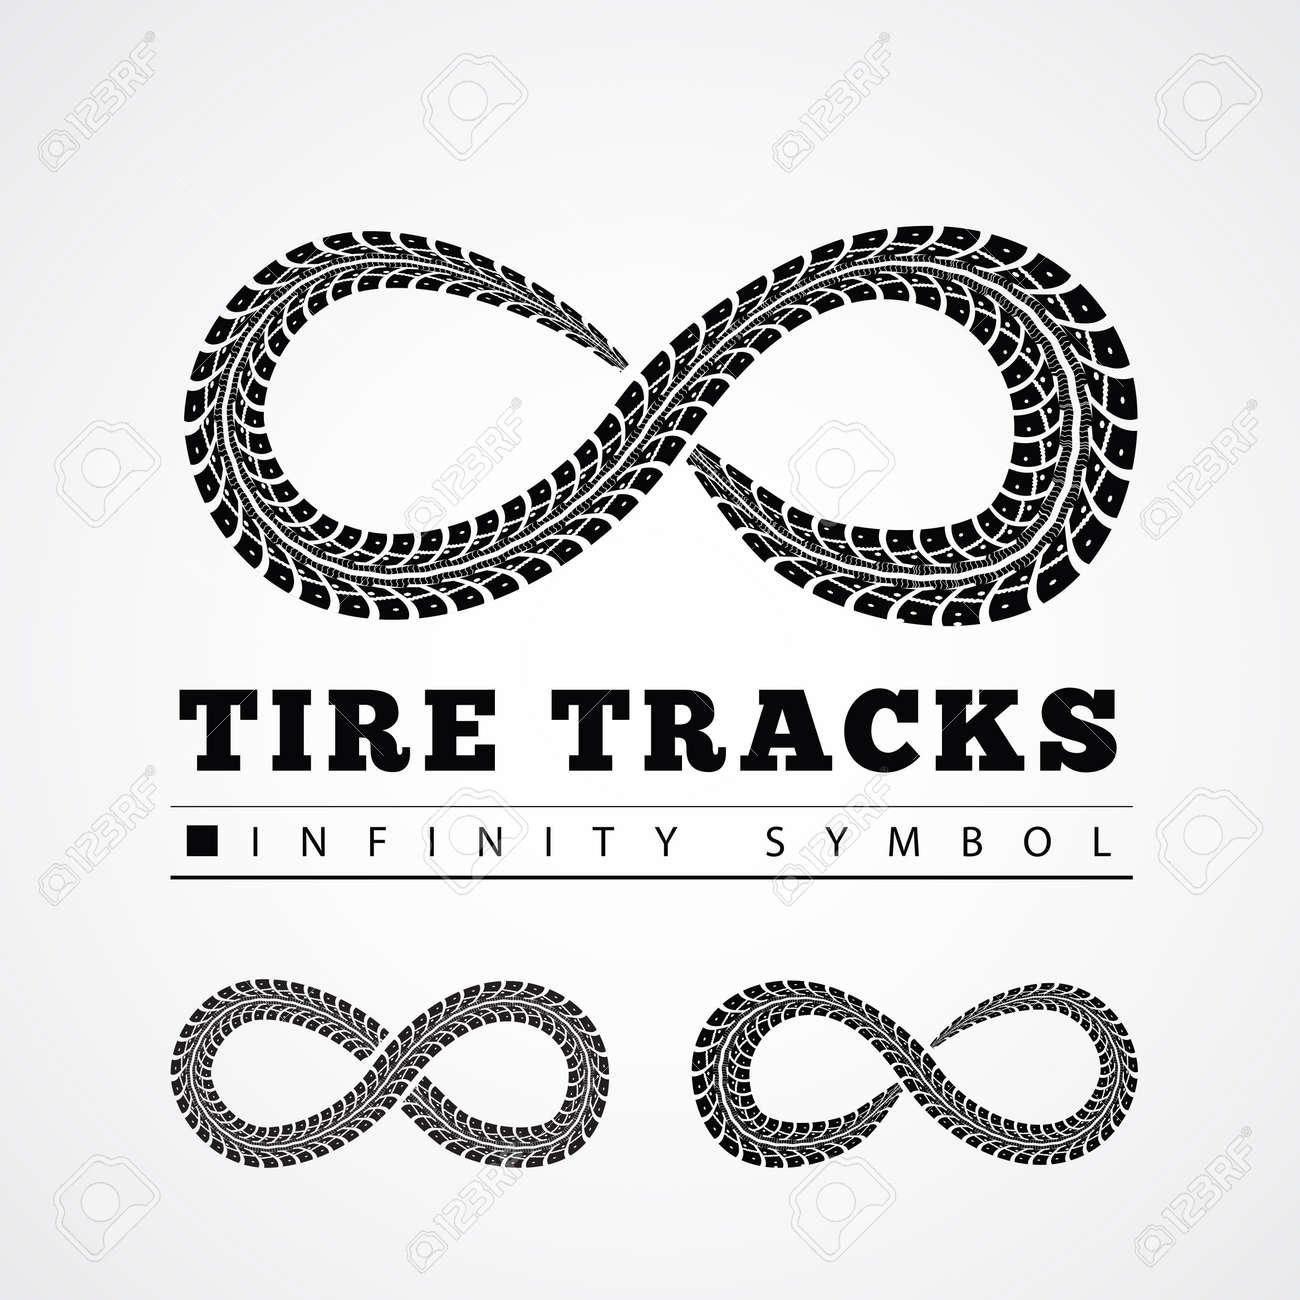 Tire Tracks in Infinity Form. Vector illustration - 35120964